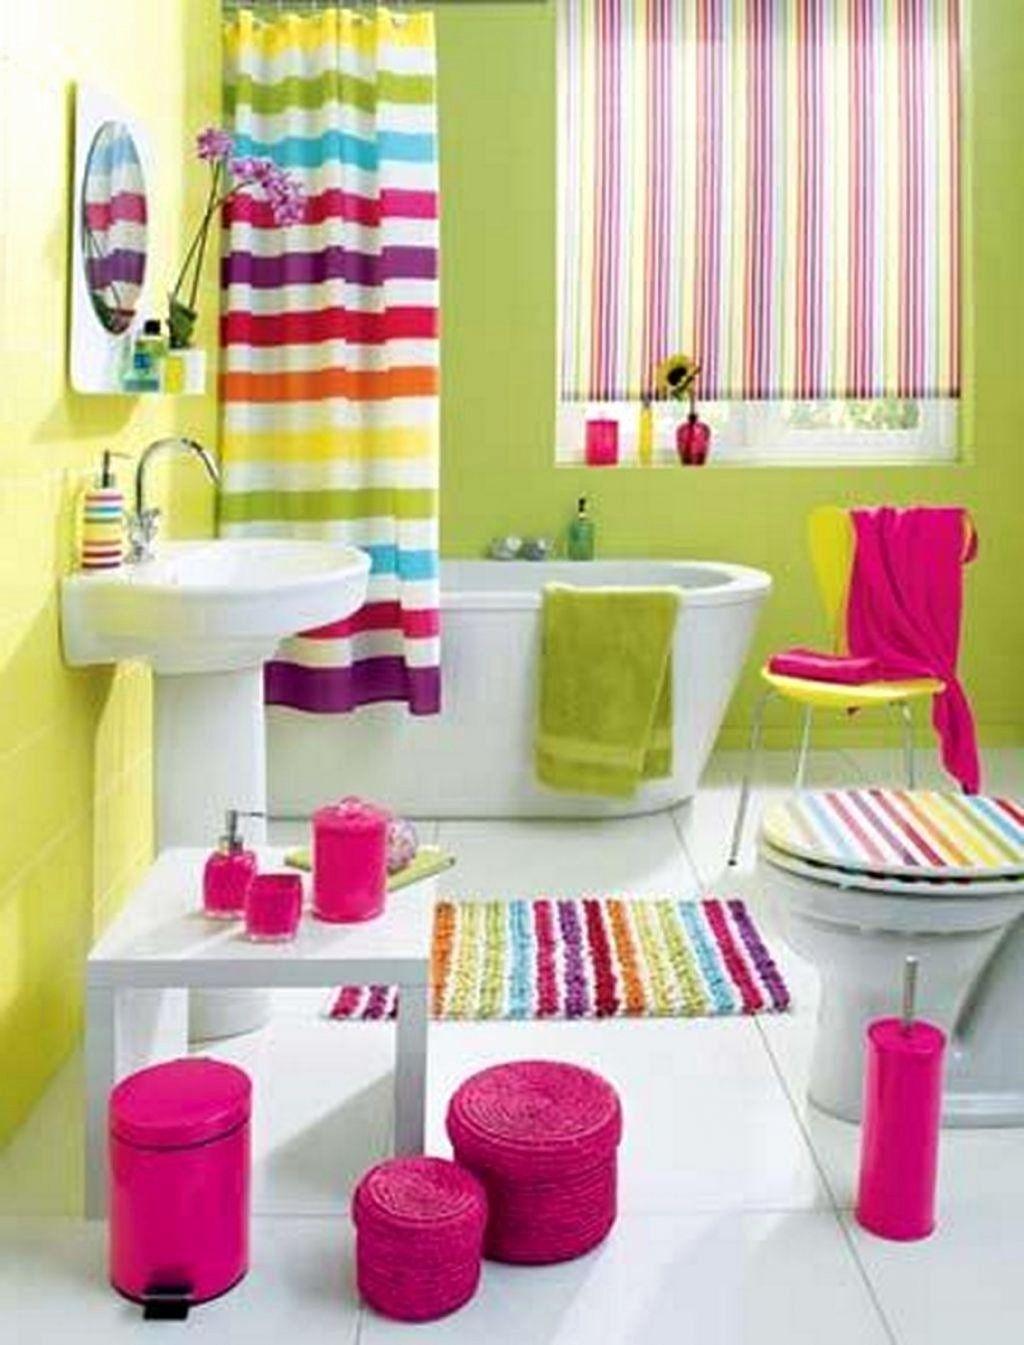 Bright Colored Bathroom Sets Beautiful, Colorful Bathroom Sets